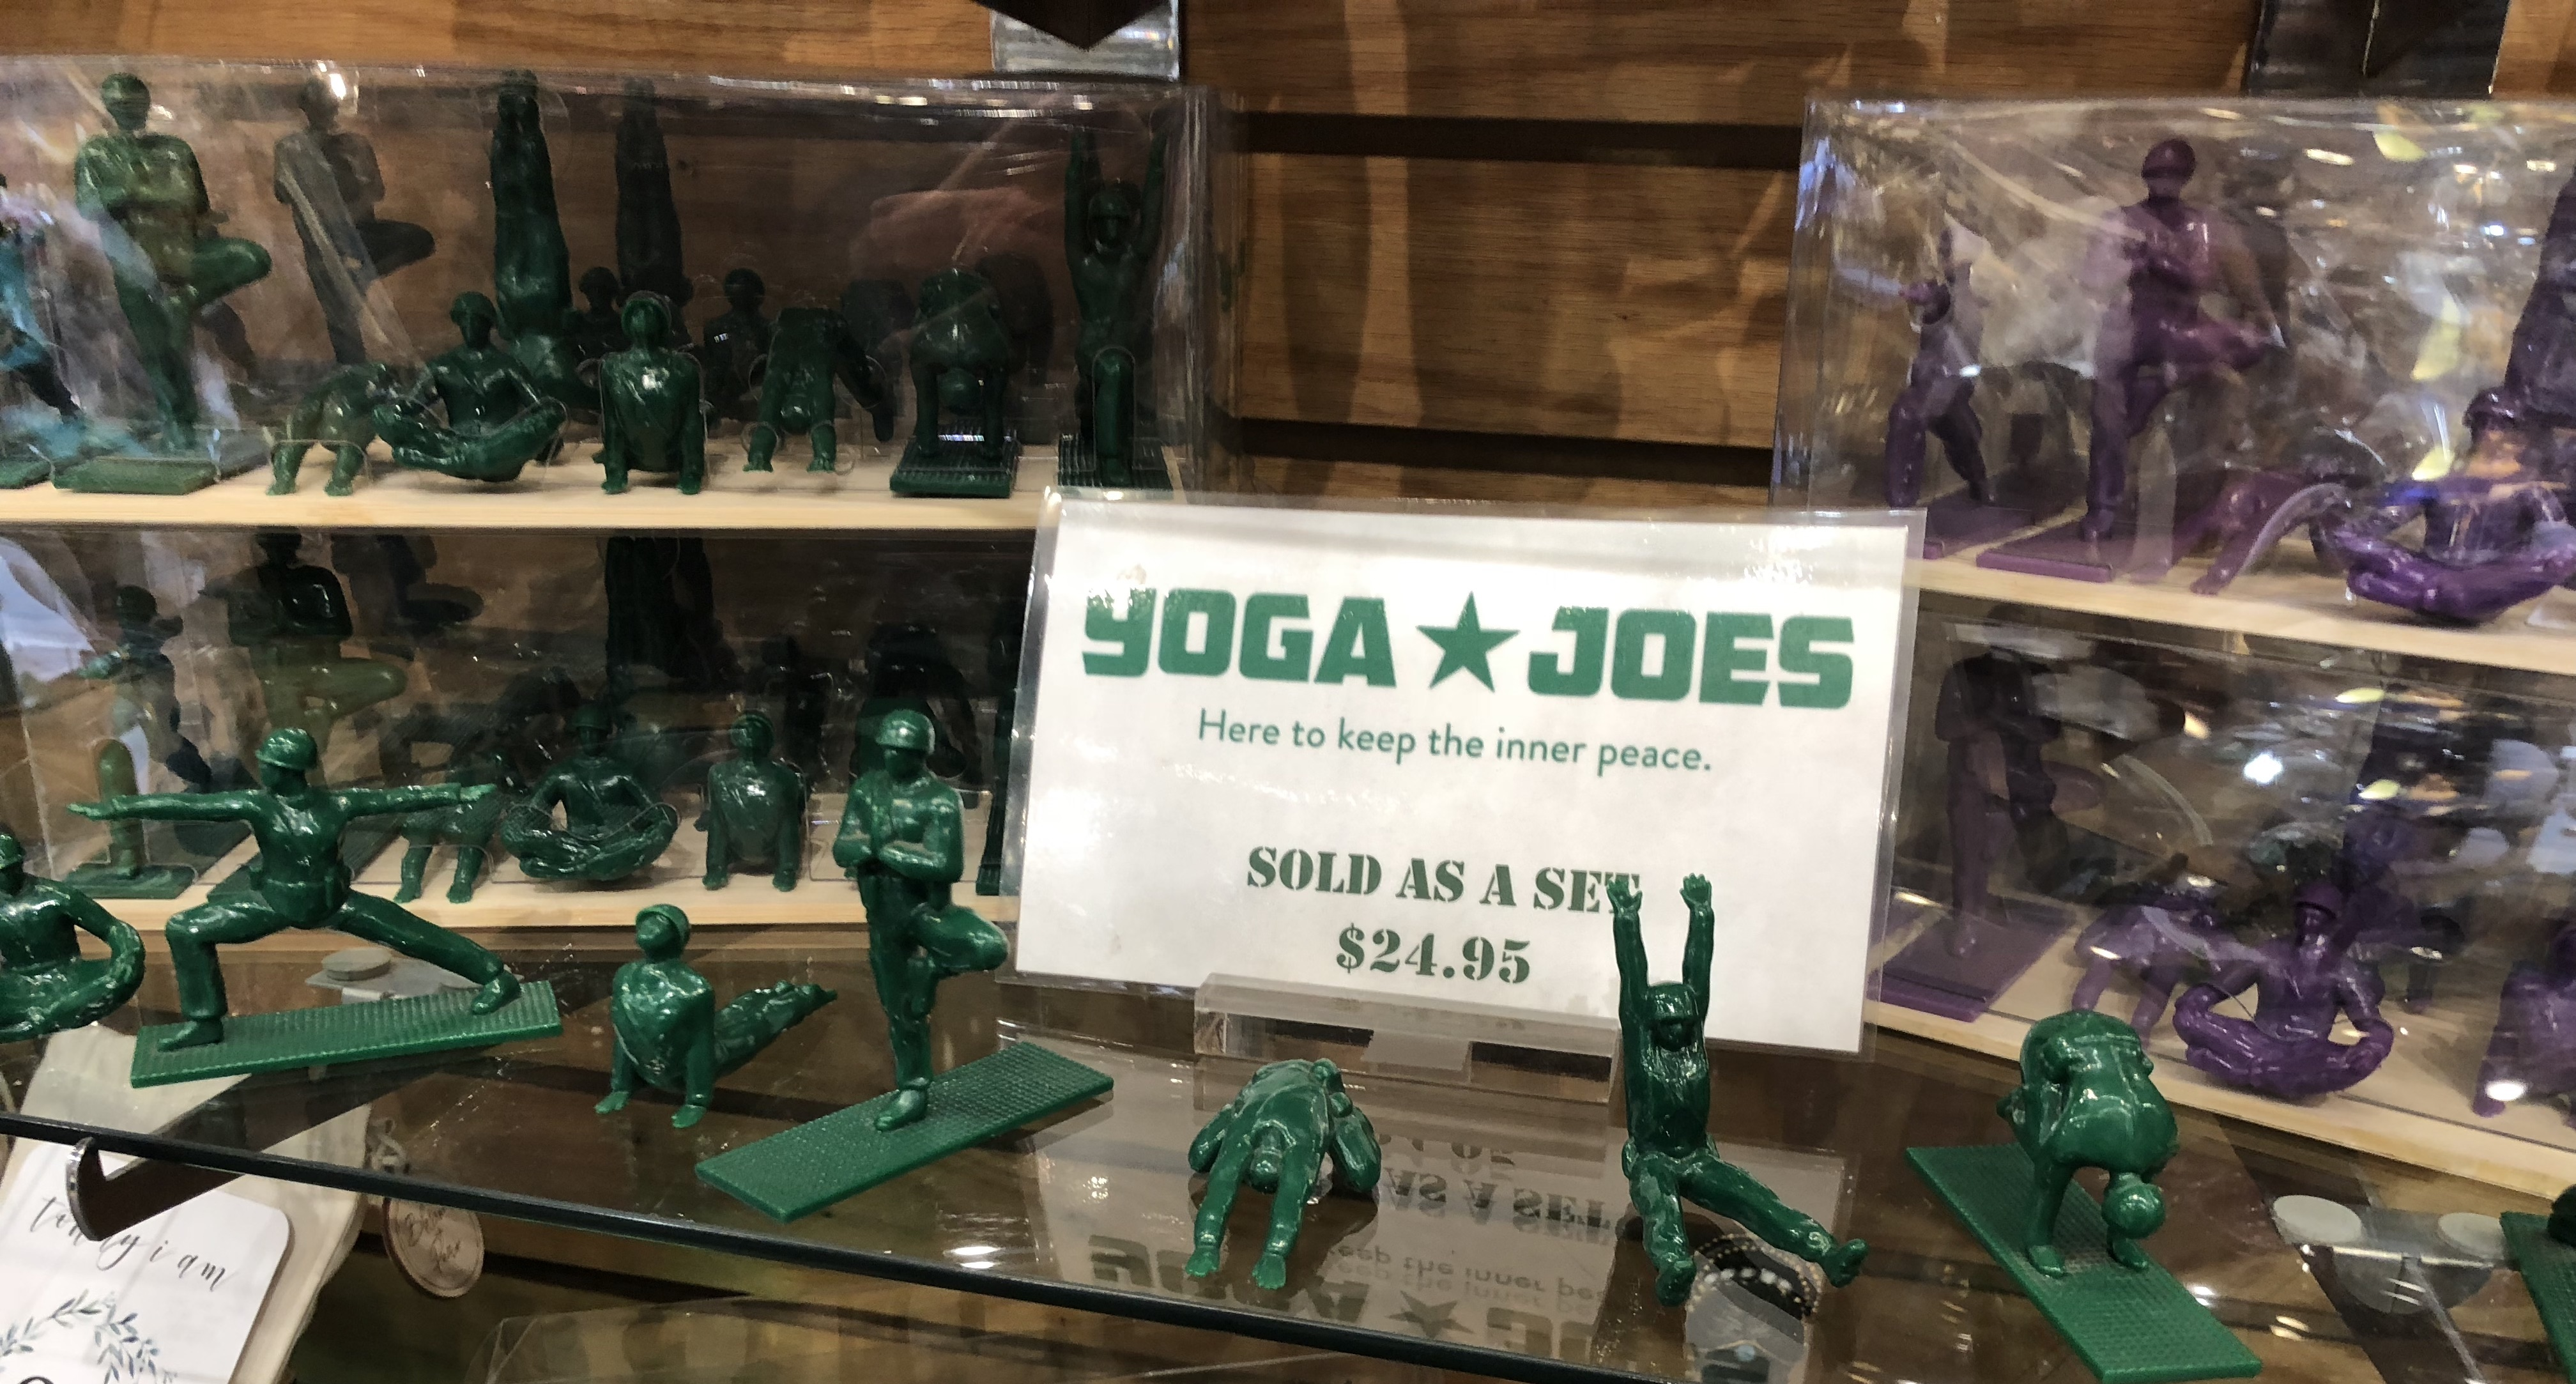 Angela Hales Yoga, LLC